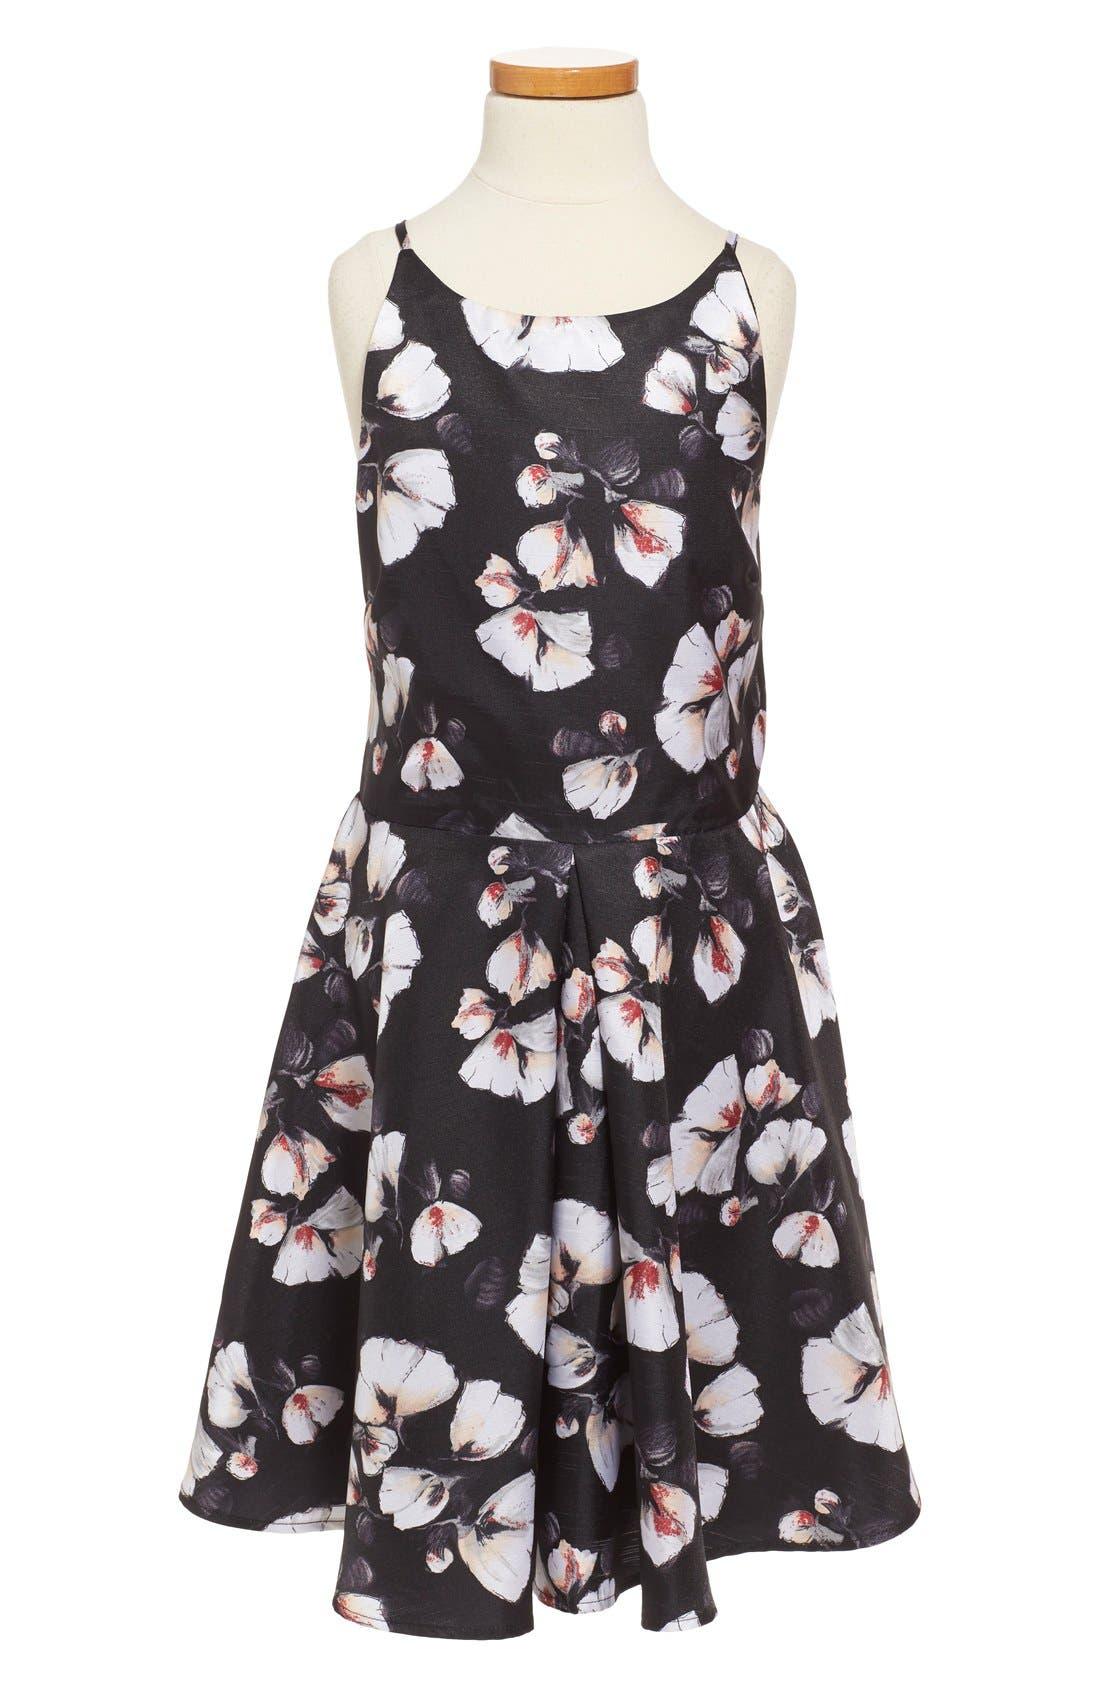 'Alexis' Flower Print Fit & Flare Dress, Main, color, 001